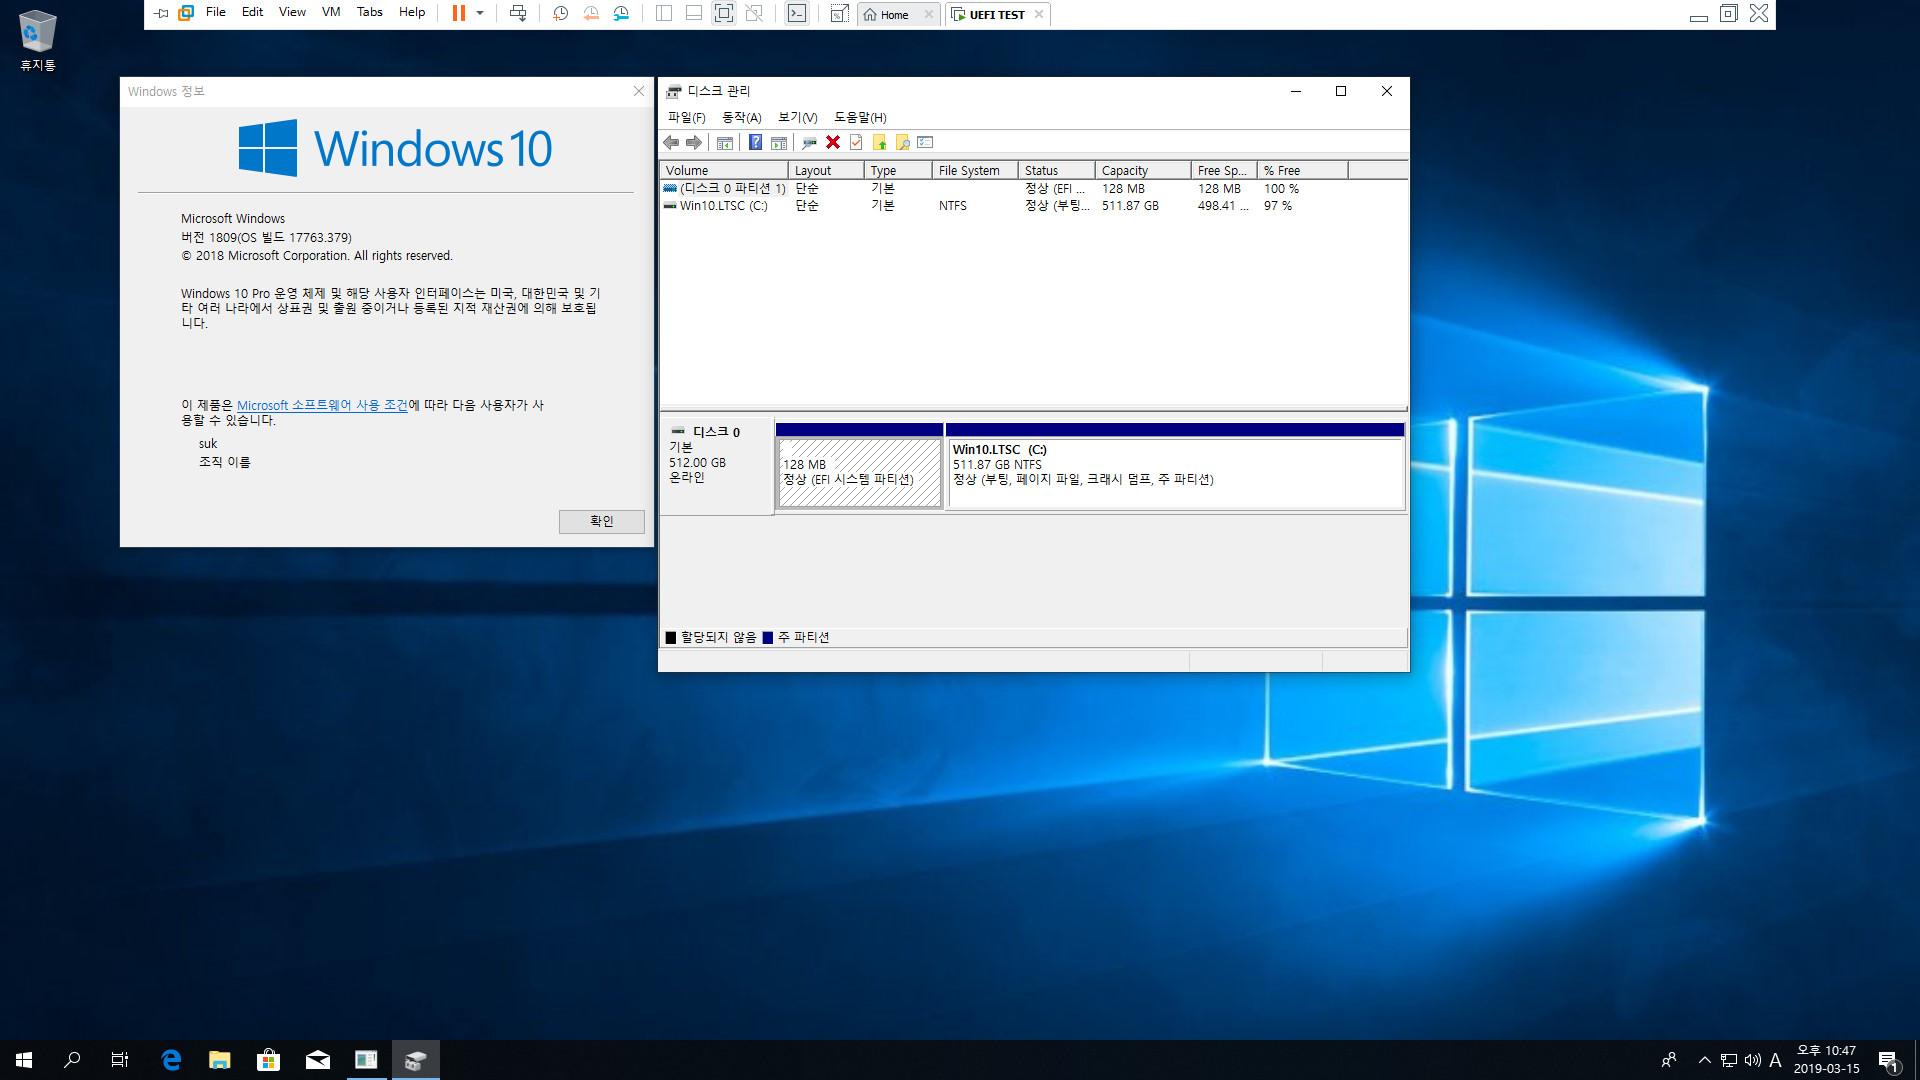 bootice.exe 으로 UEFI용 파티션 만들고 WinNTSetup.exe 으로 윈도 설치하기 예시 2019-03-15_224754.jpg